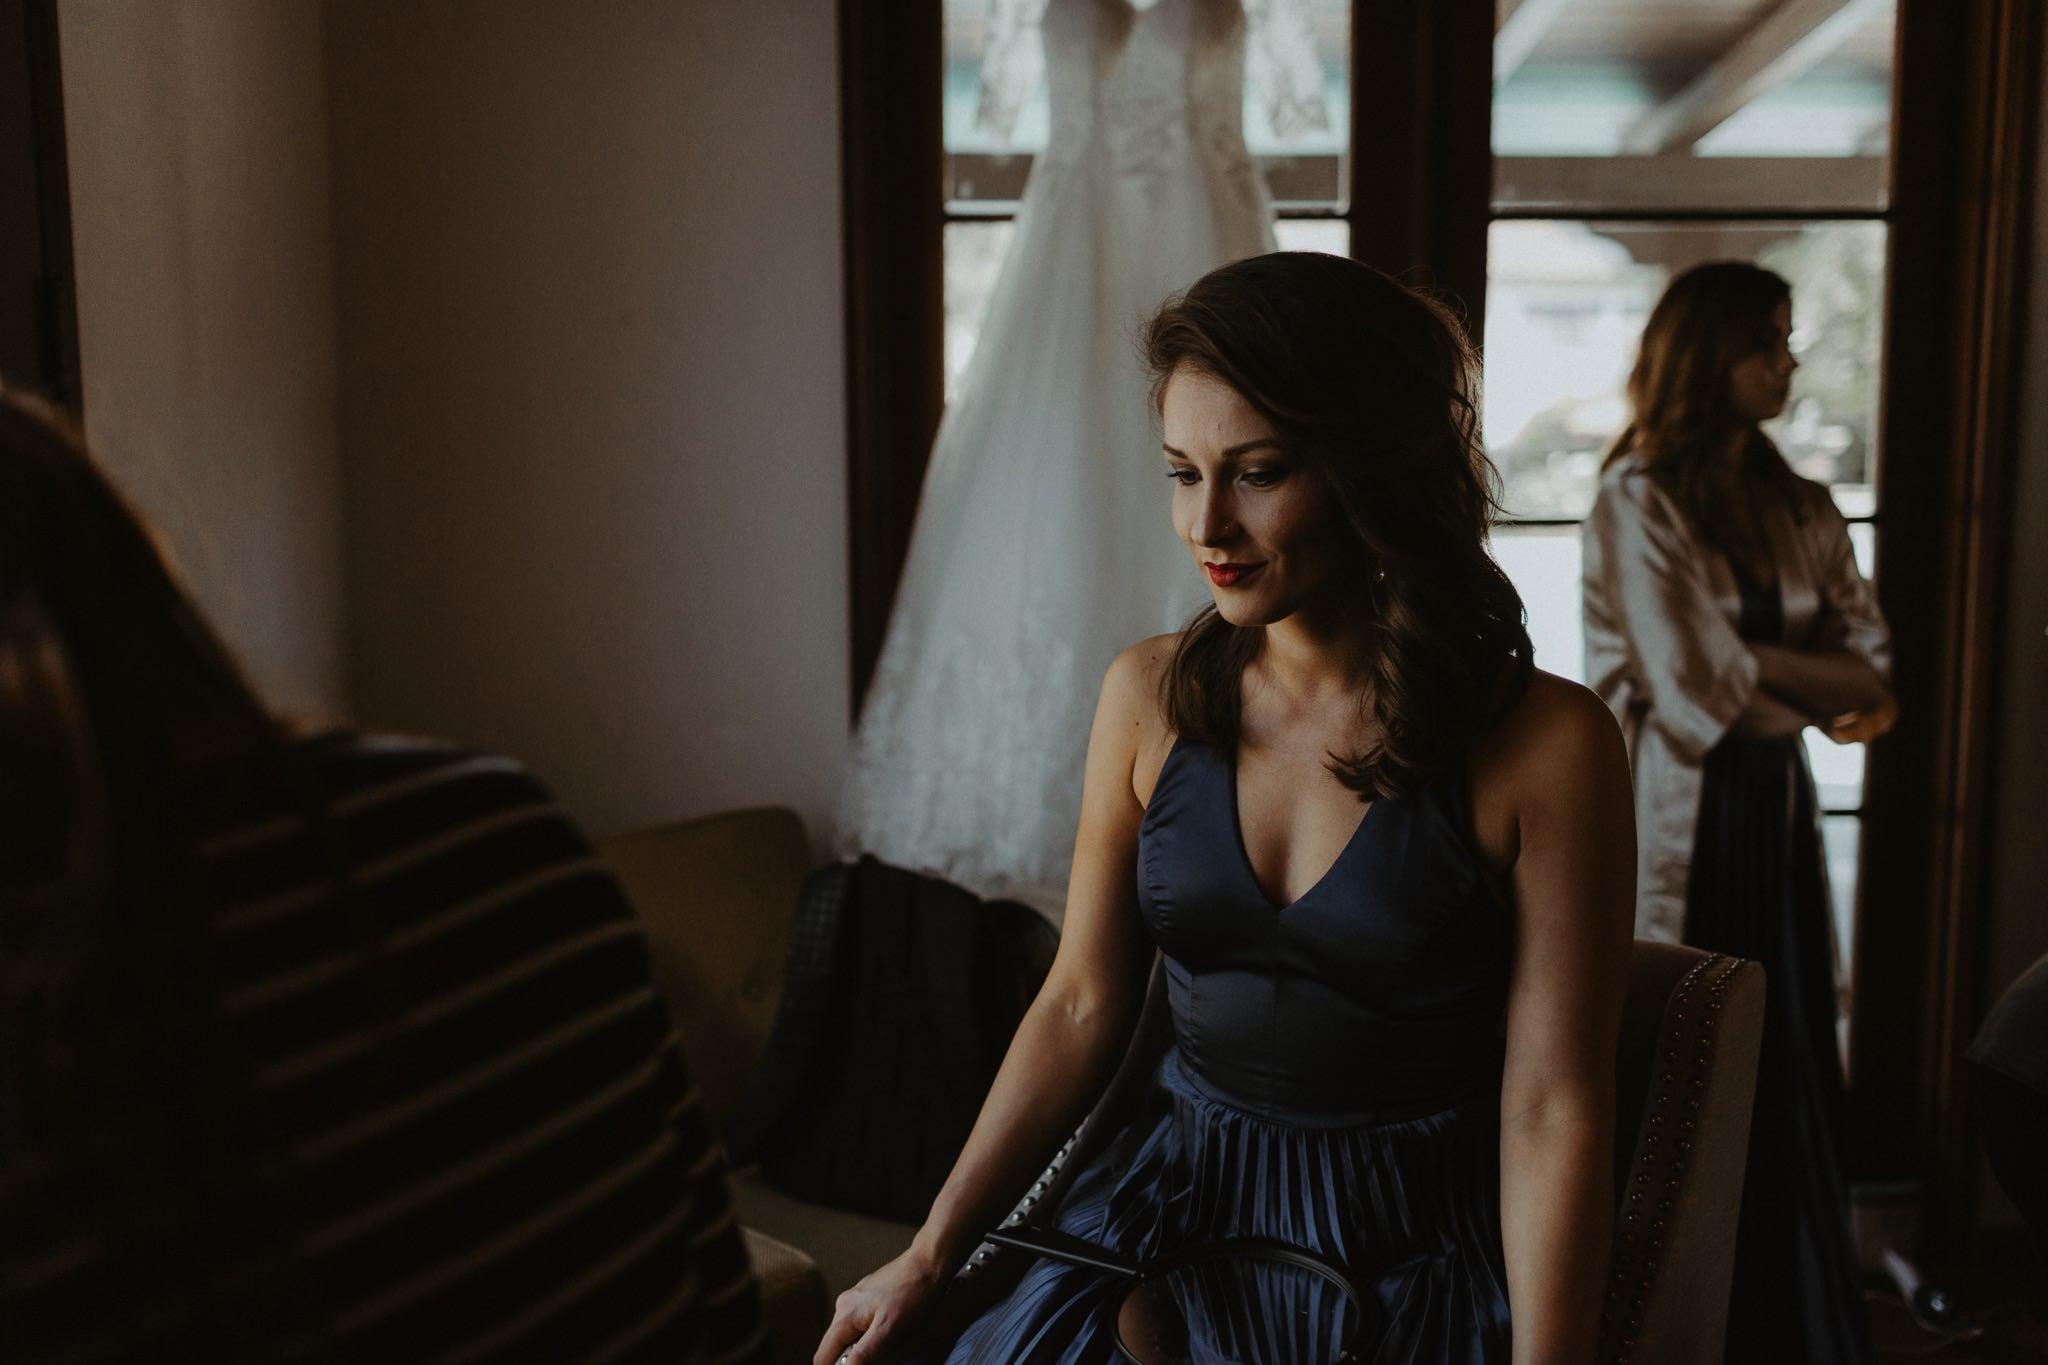 simi valley wedding photography 038